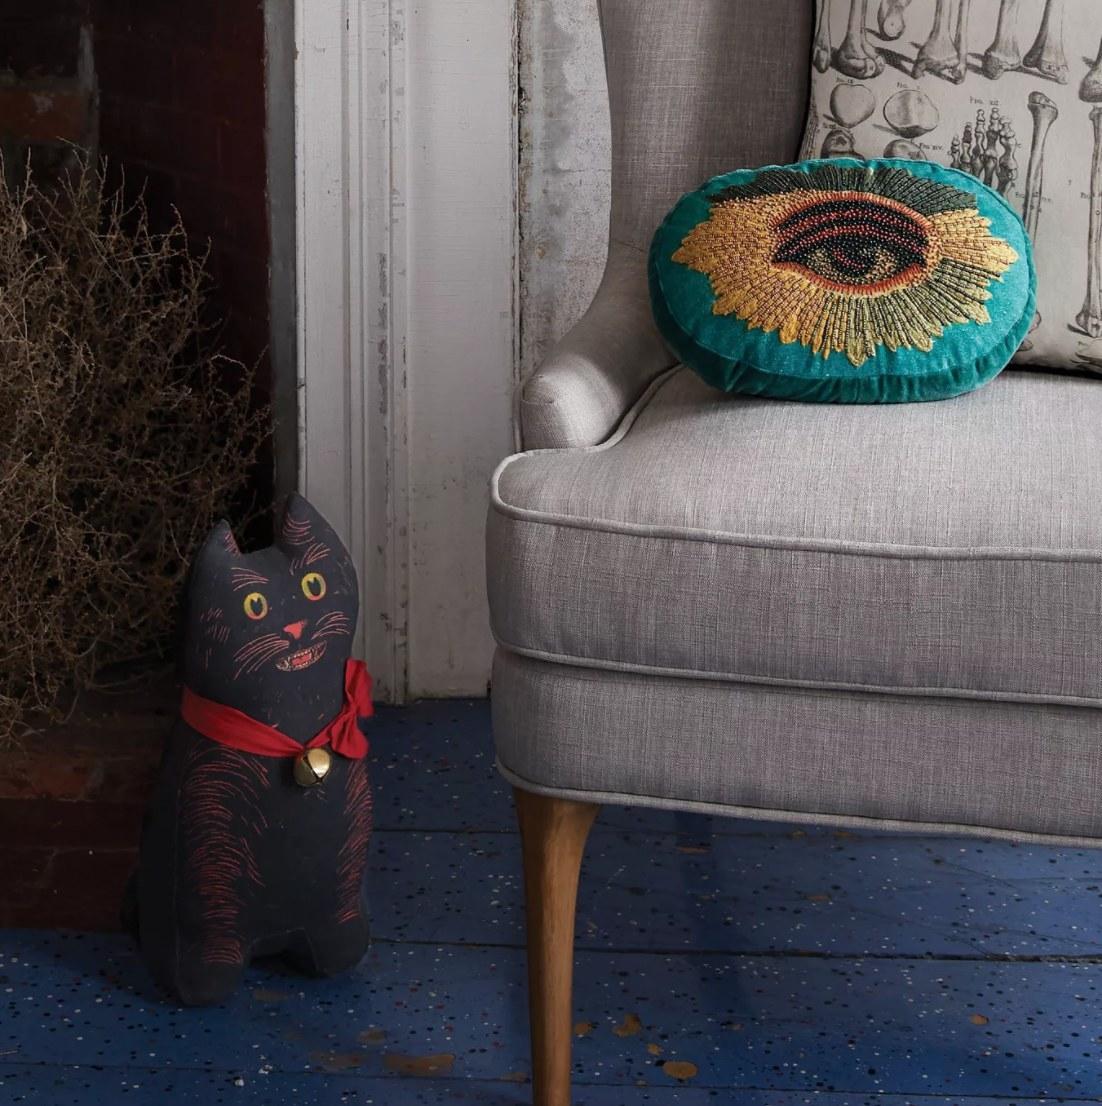 The teal eye pillow